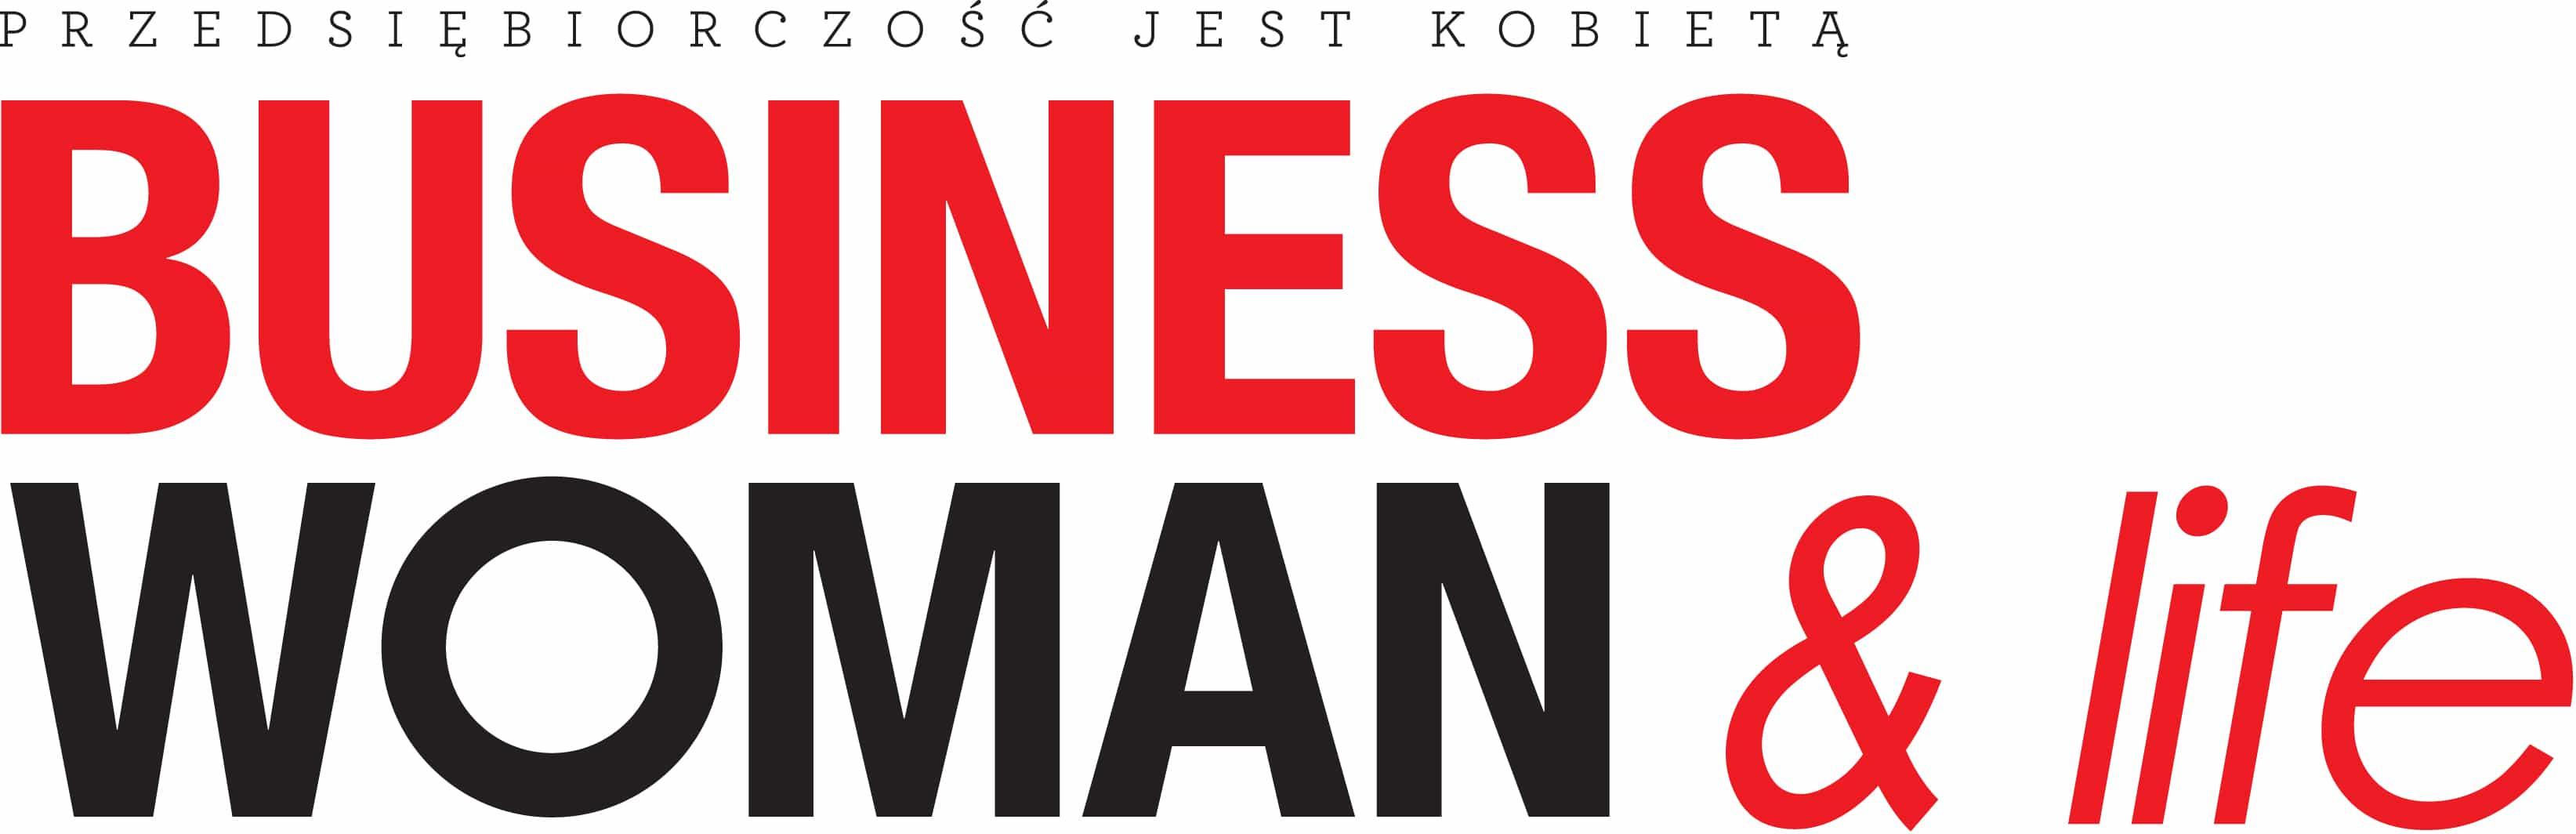 Business Woman & Life ExcellenceVale